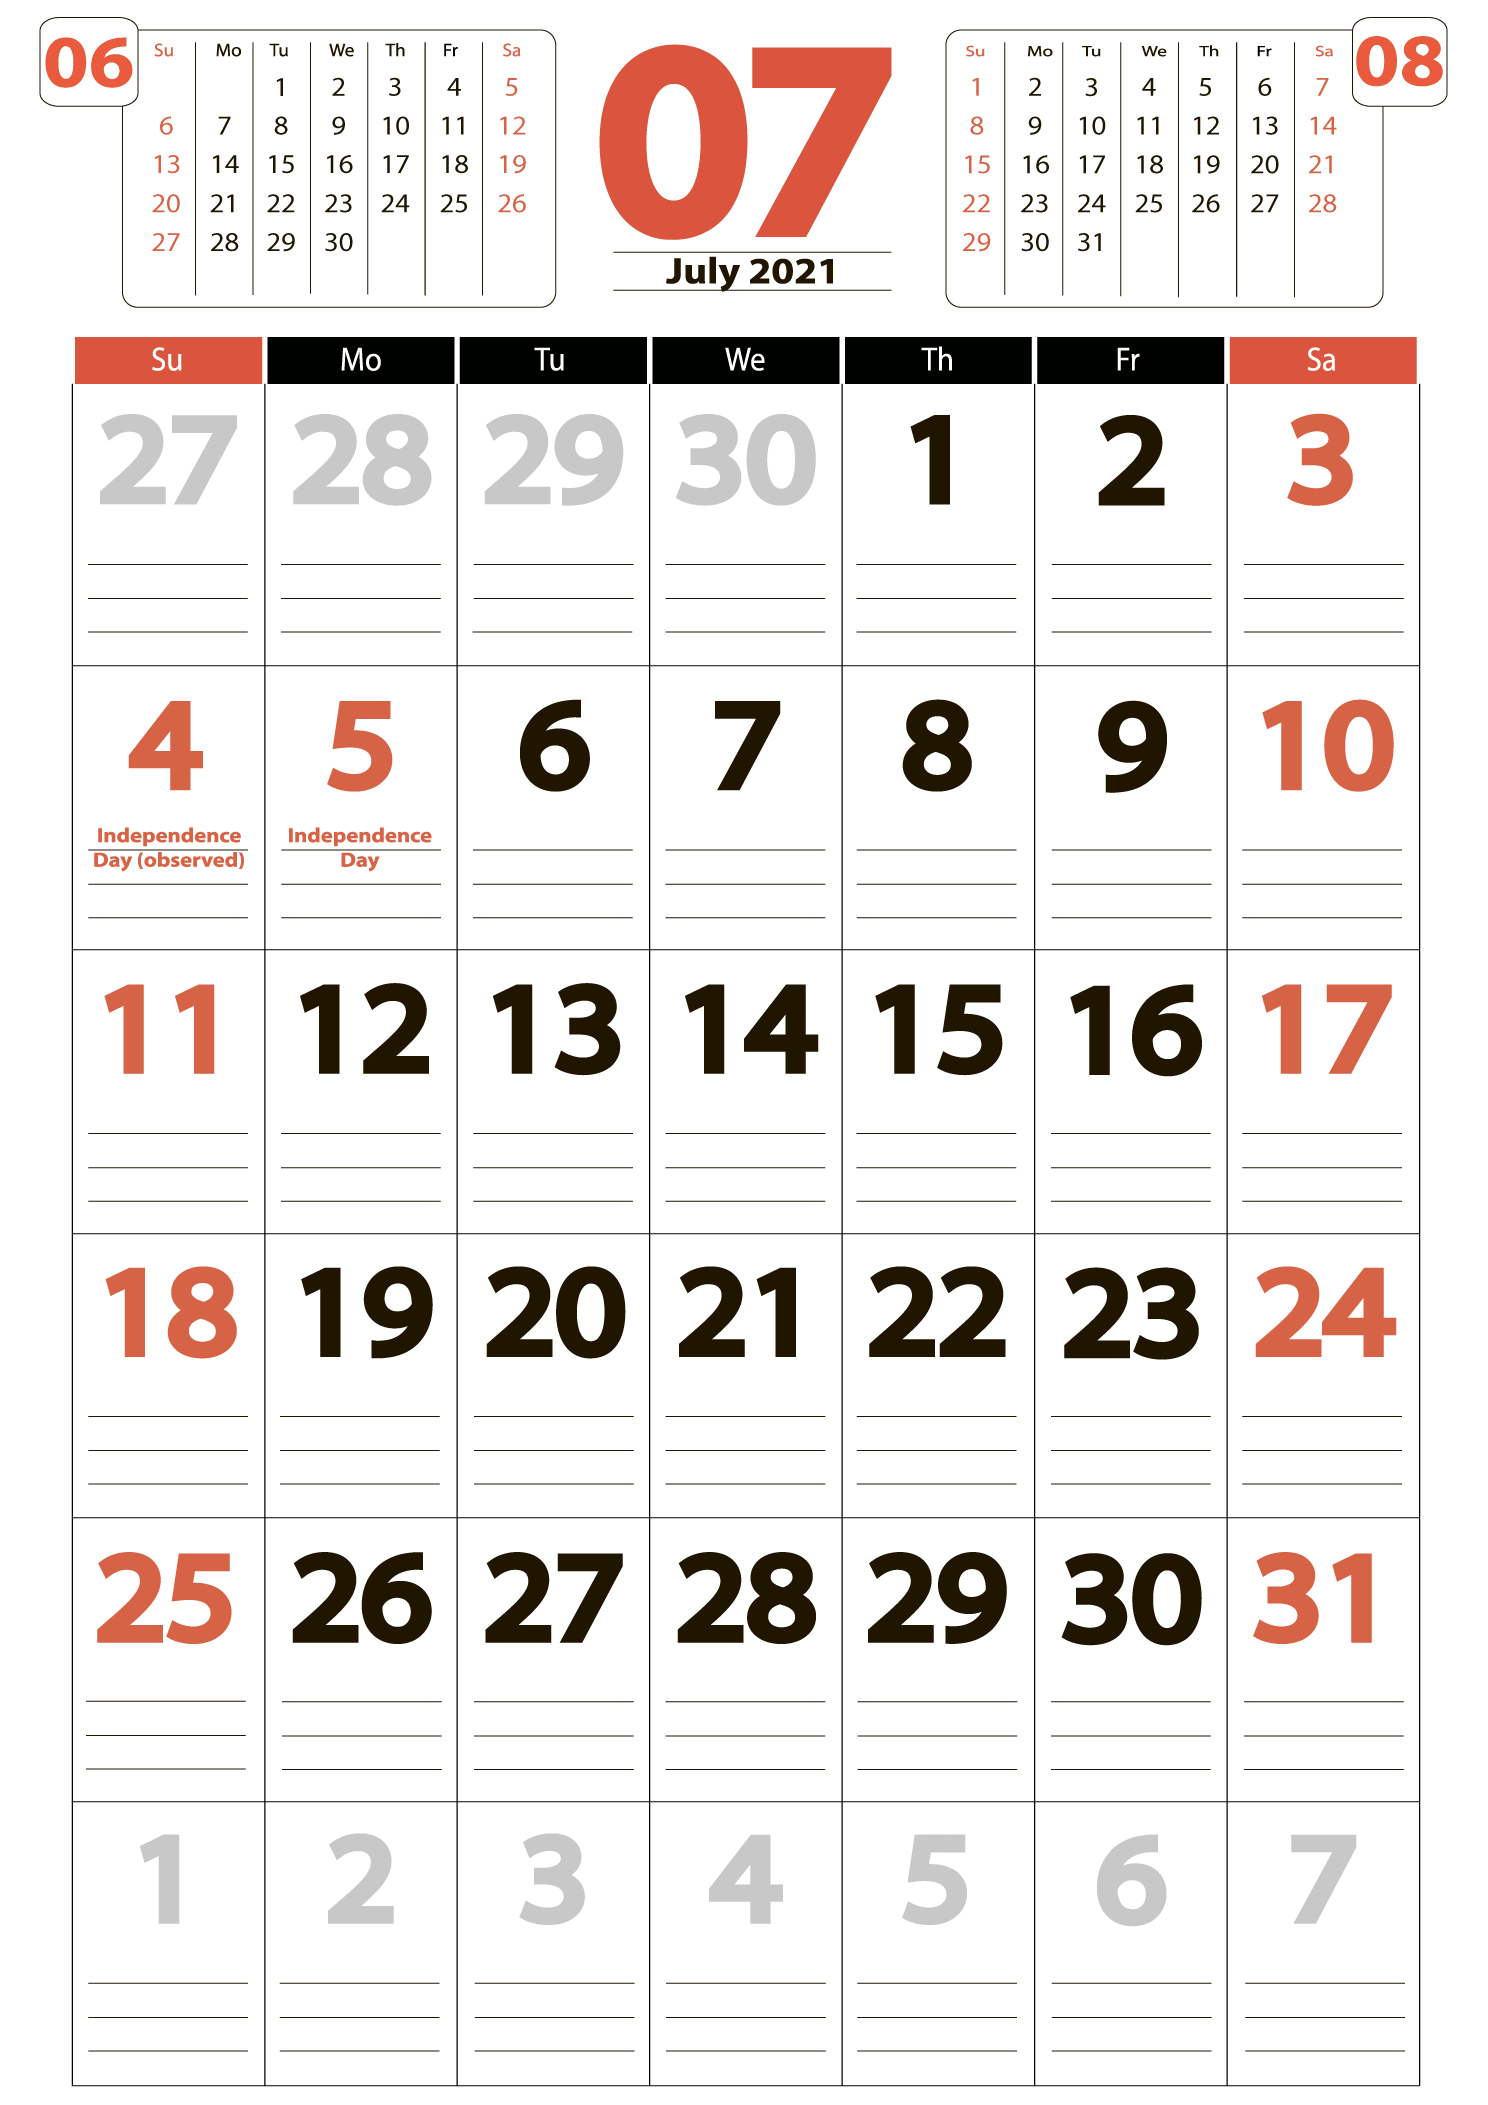 Download calendar 07 2021